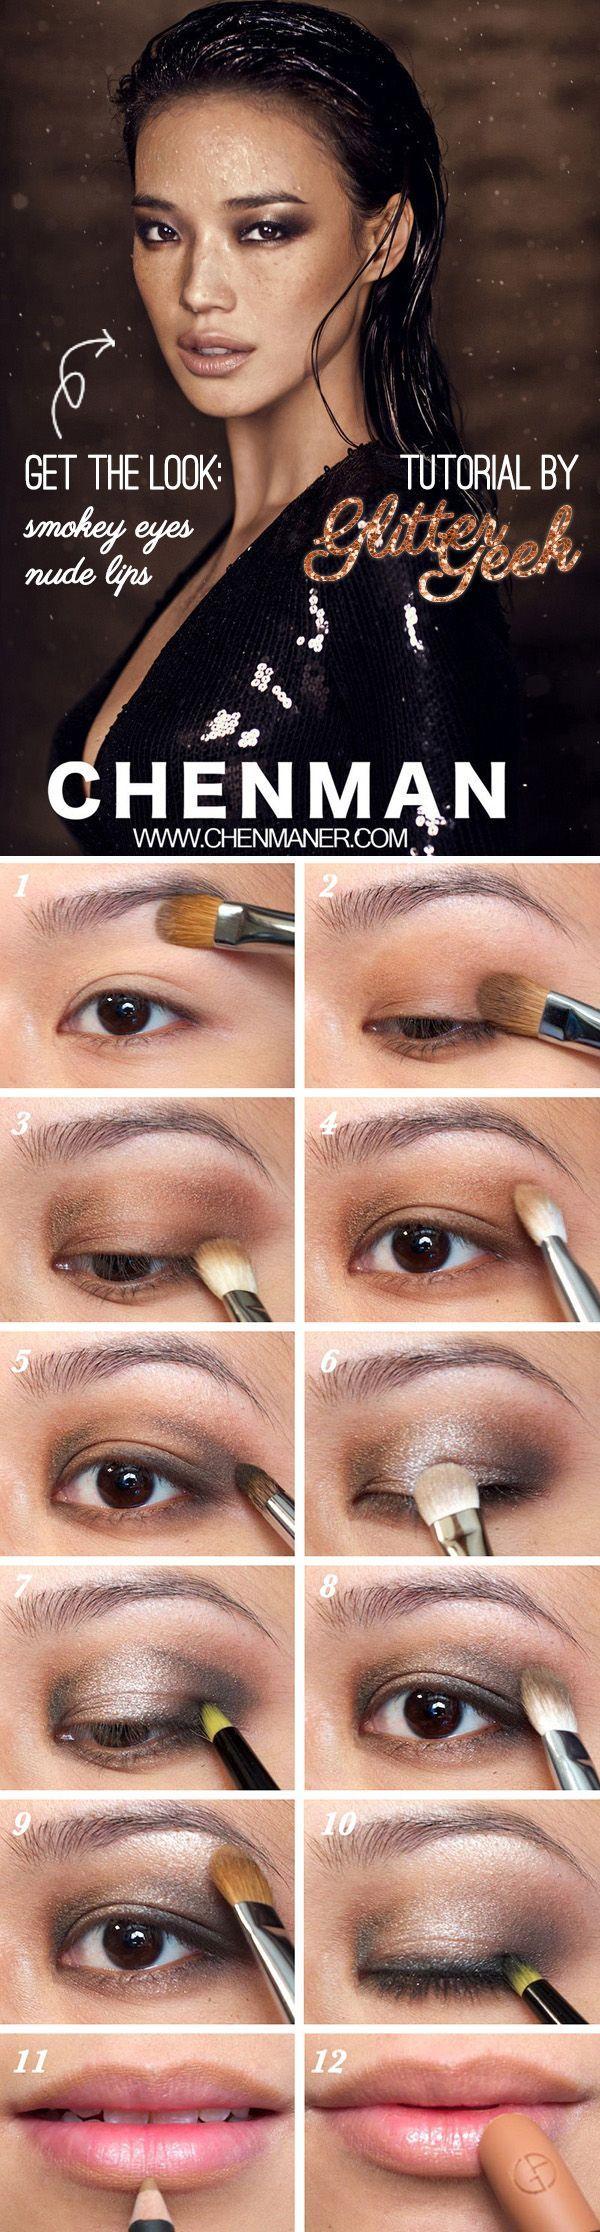 Shu Qi on Harper's Bazaar 2011 (Smokey Eyes and Nude Lips Makeup Tutorial)   Glitter Geek